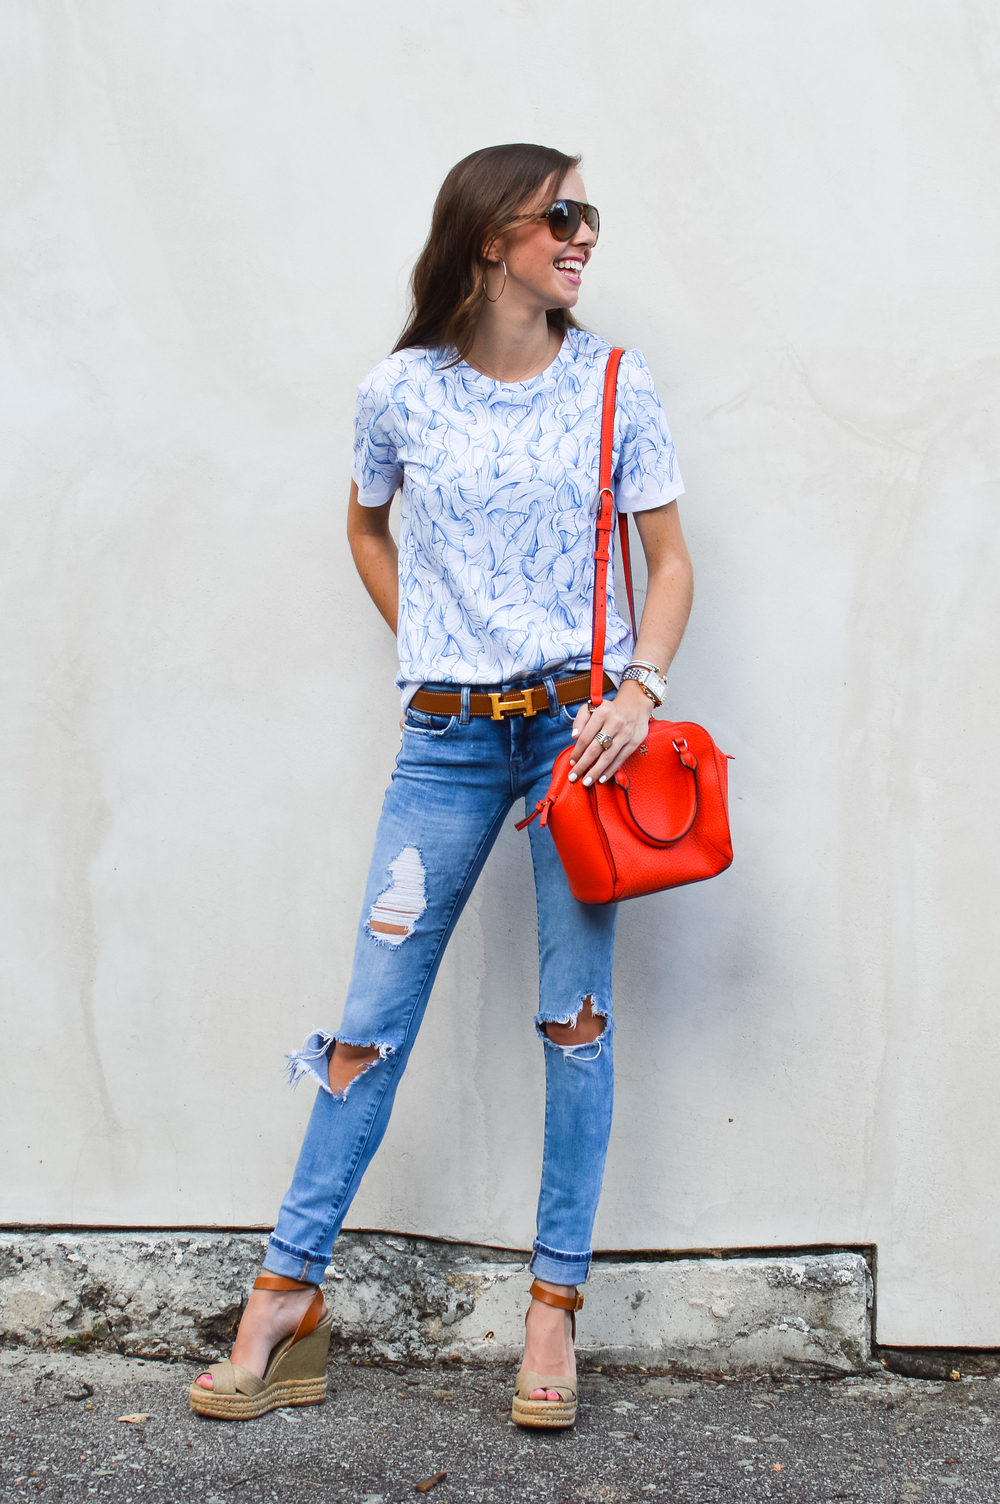 lcb_style_fashion_blogger_tory burch top (1 of 29).jpg